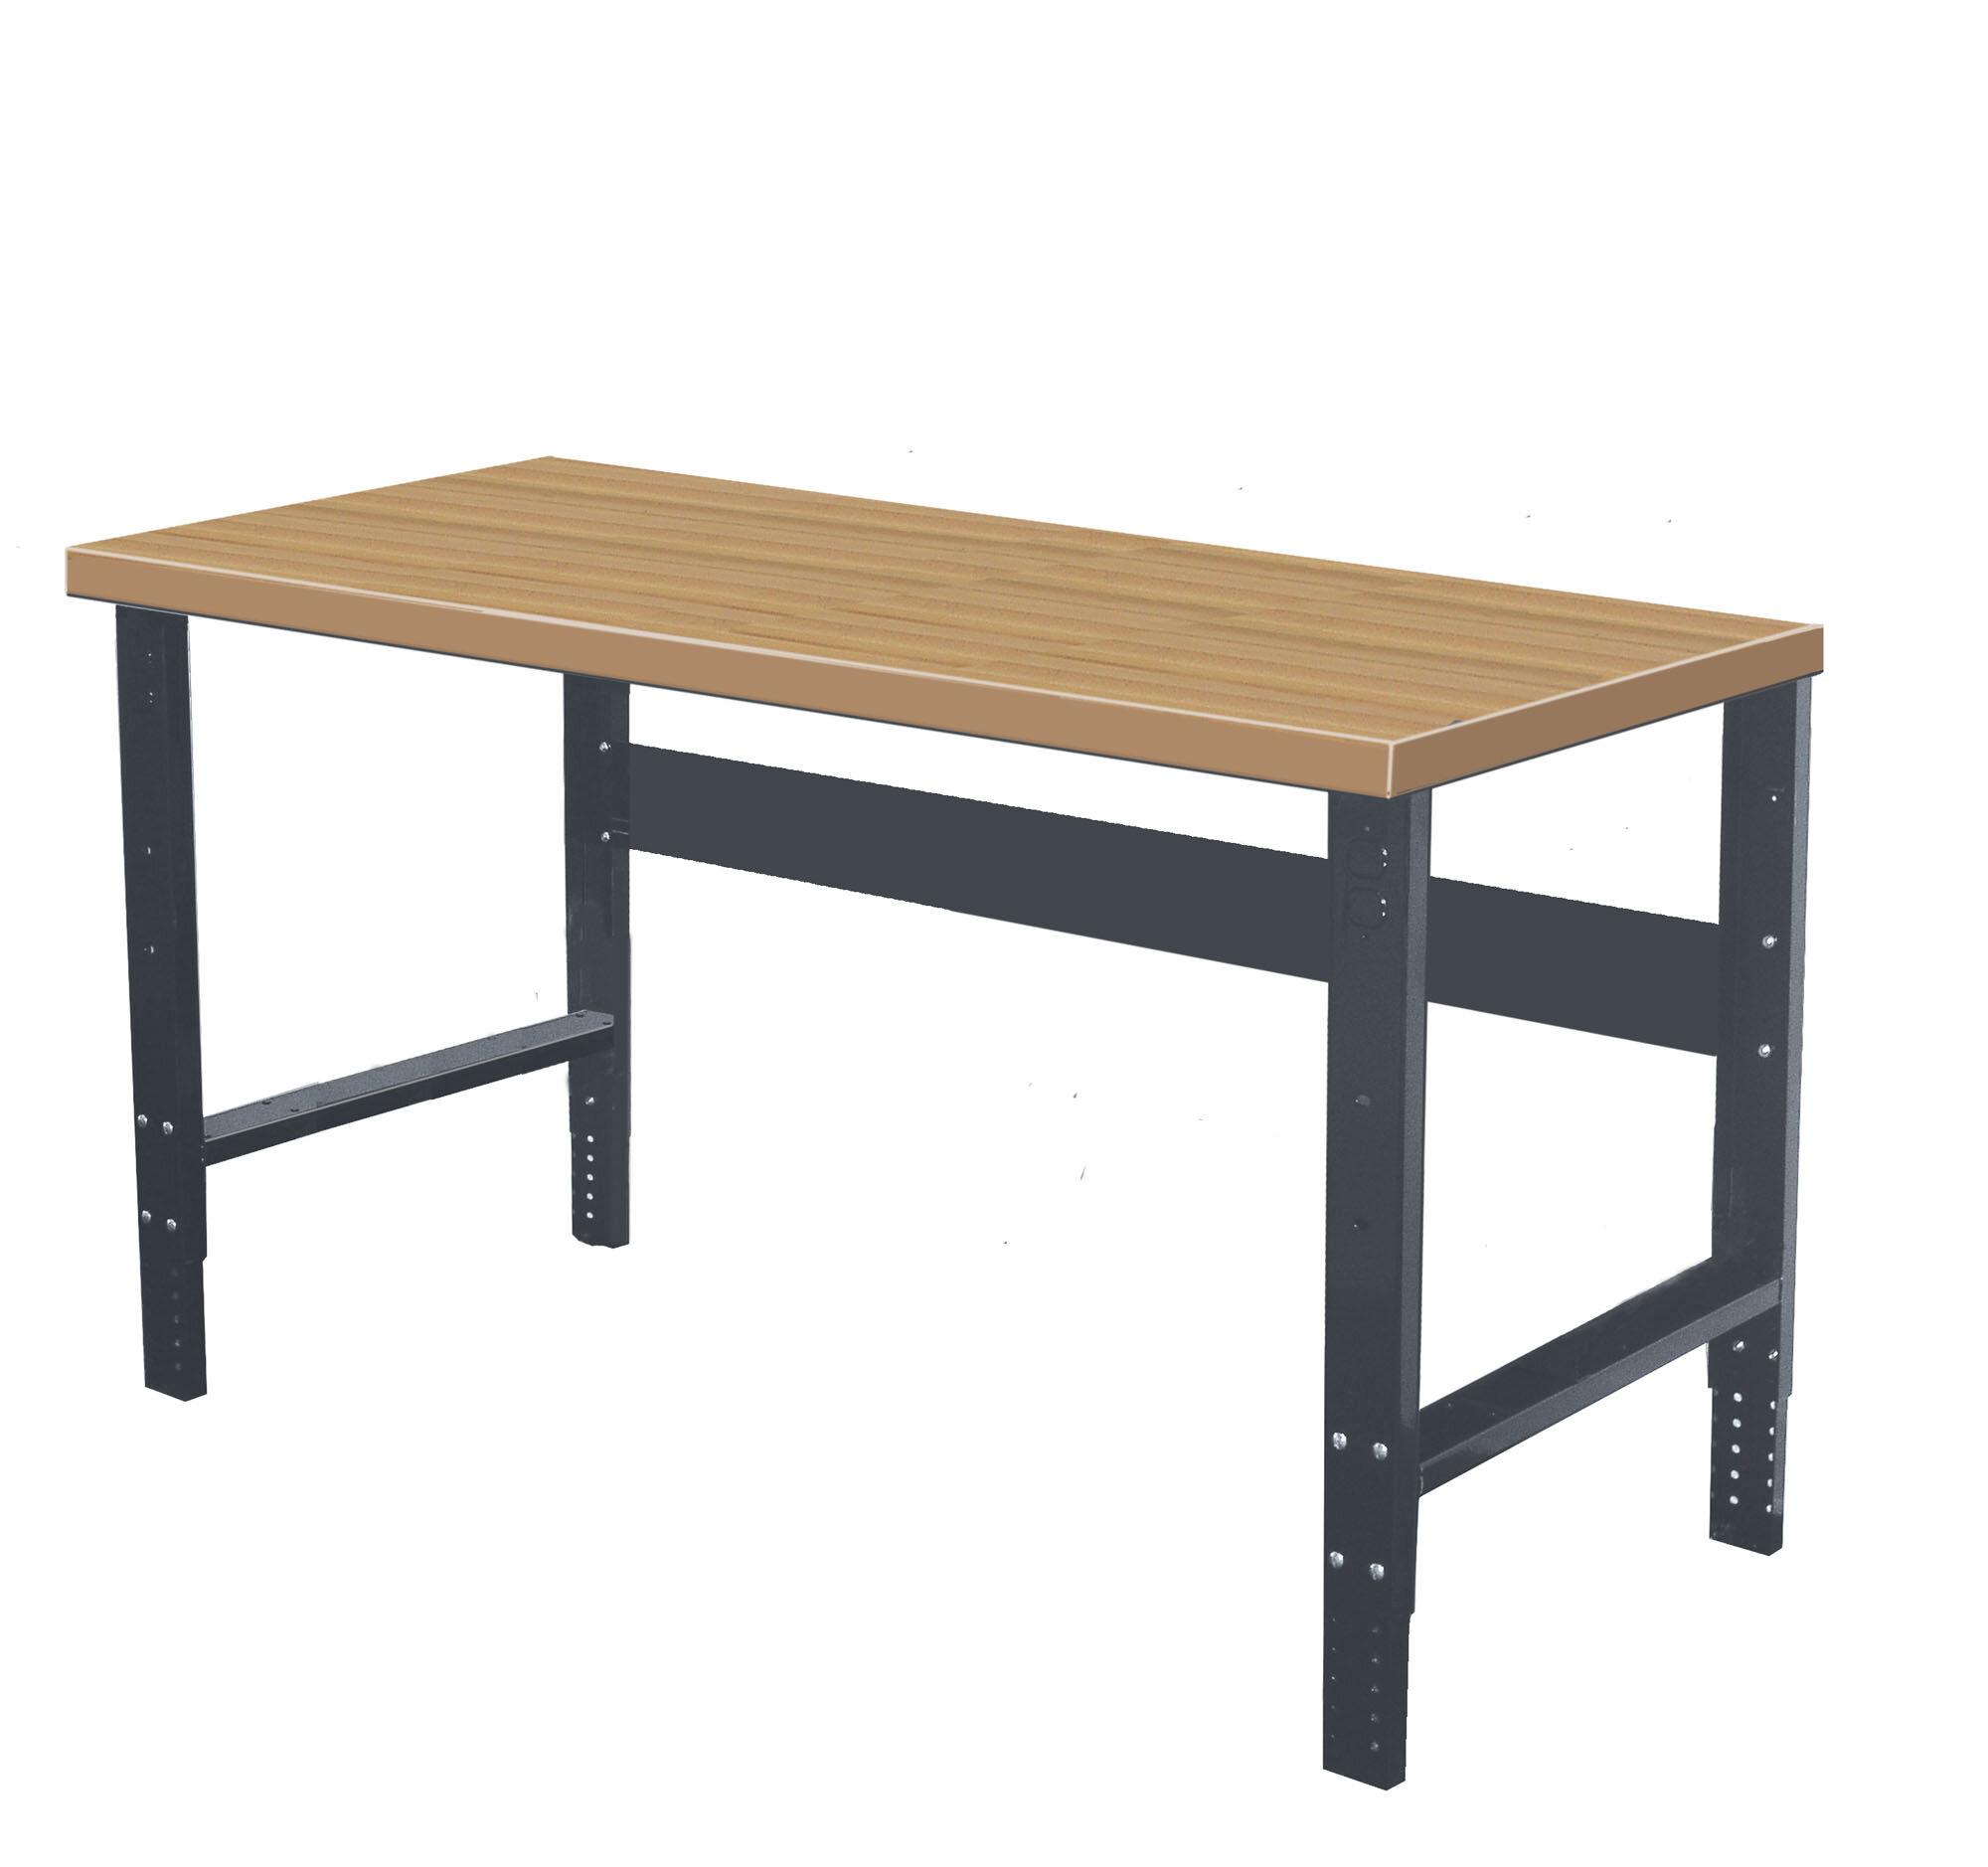 Super Shop Adjustable Height Wood Top Workbench Creativecarmelina Interior Chair Design Creativecarmelinacom